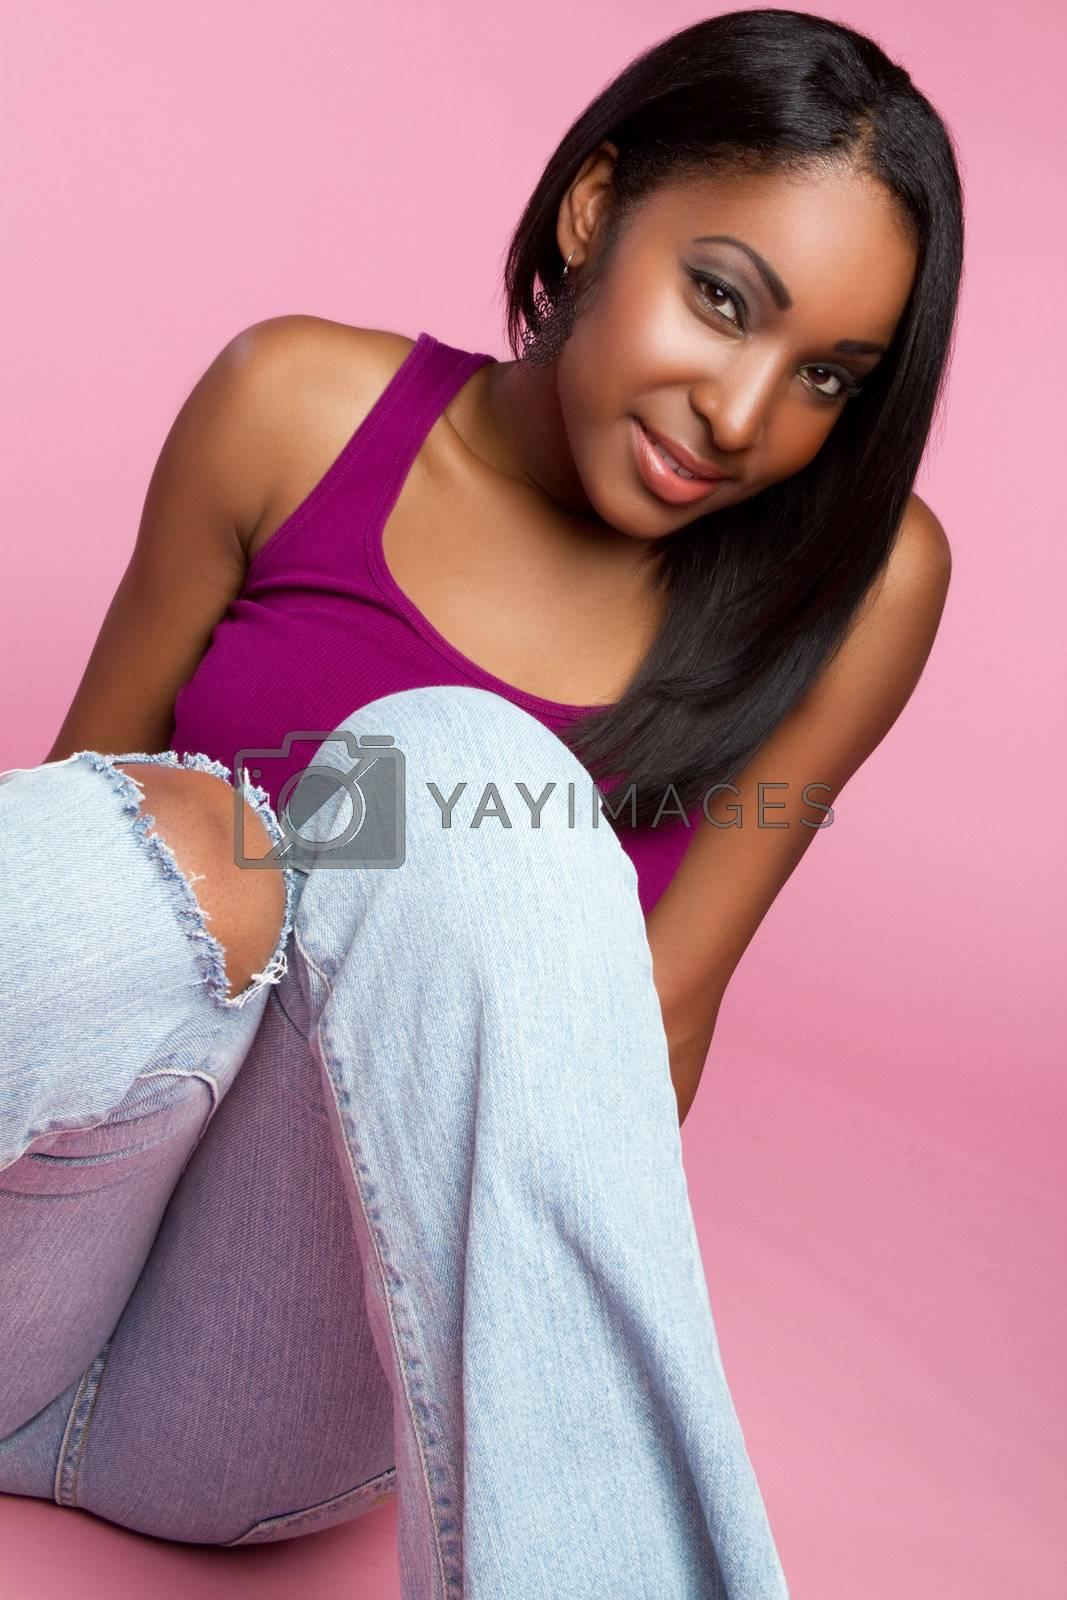 Beautiful smiling black teen girl